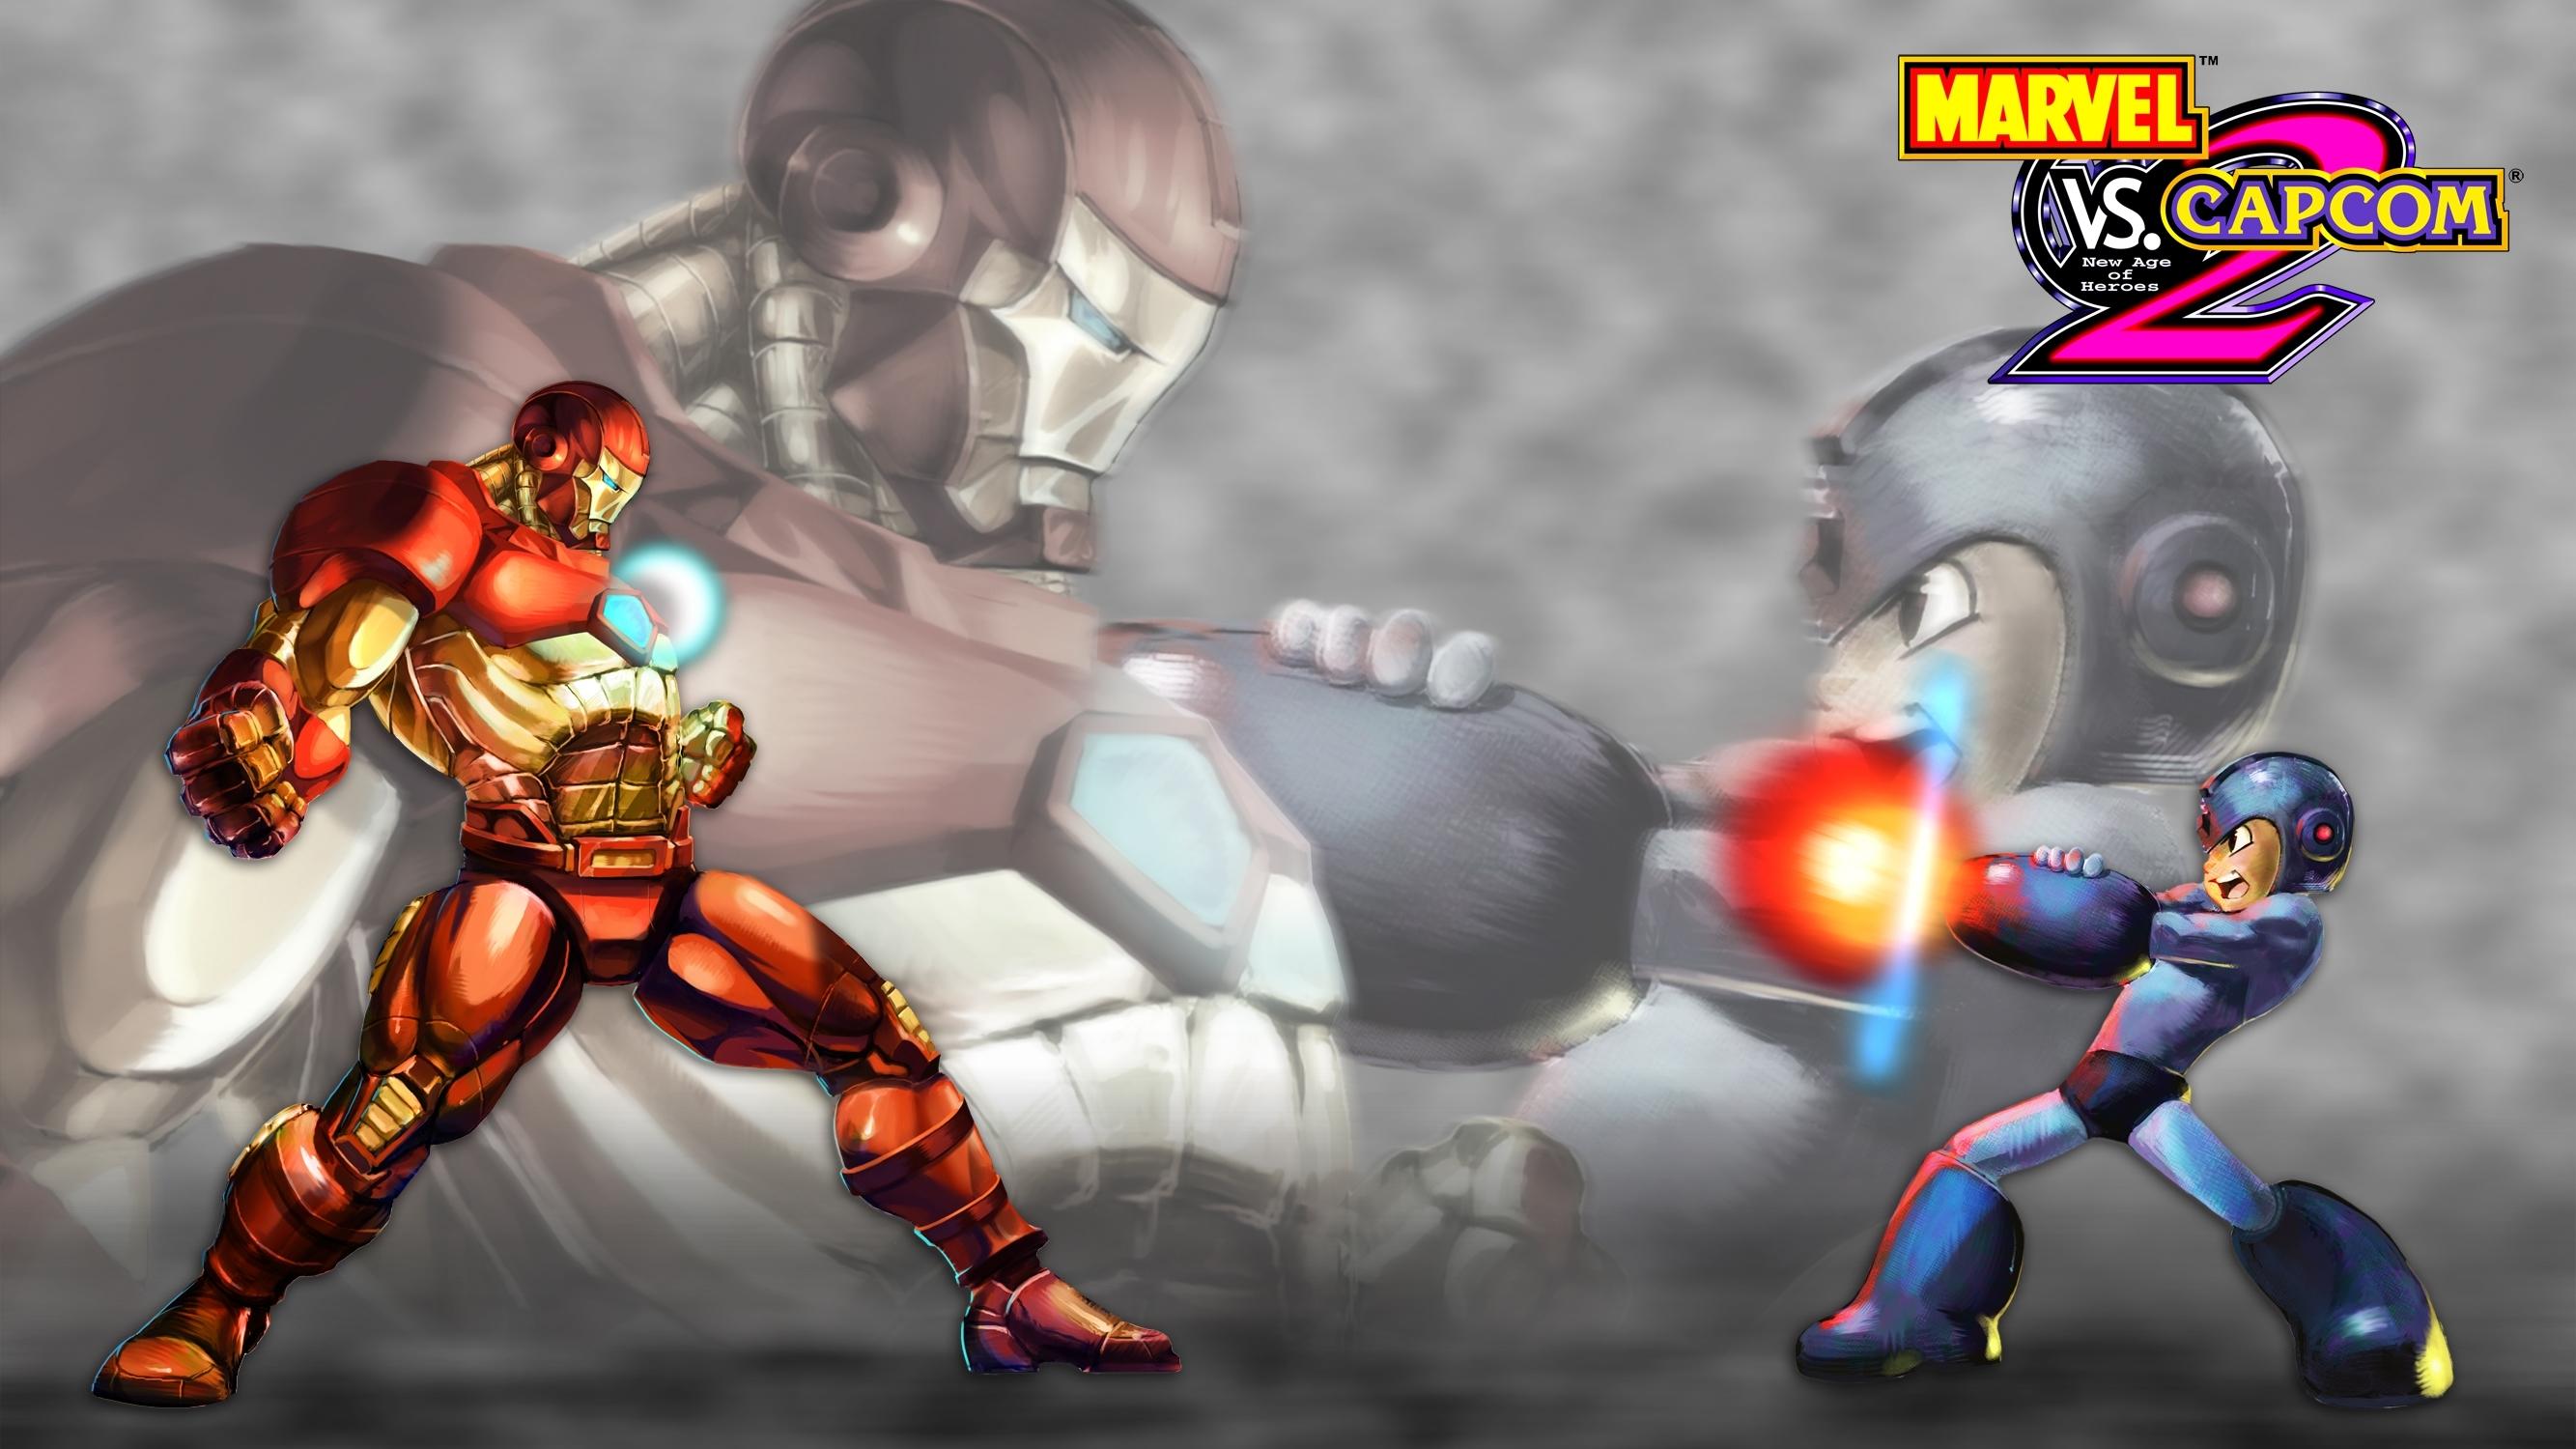 marvel vs. capcom 2 full hd wallpaper and background image